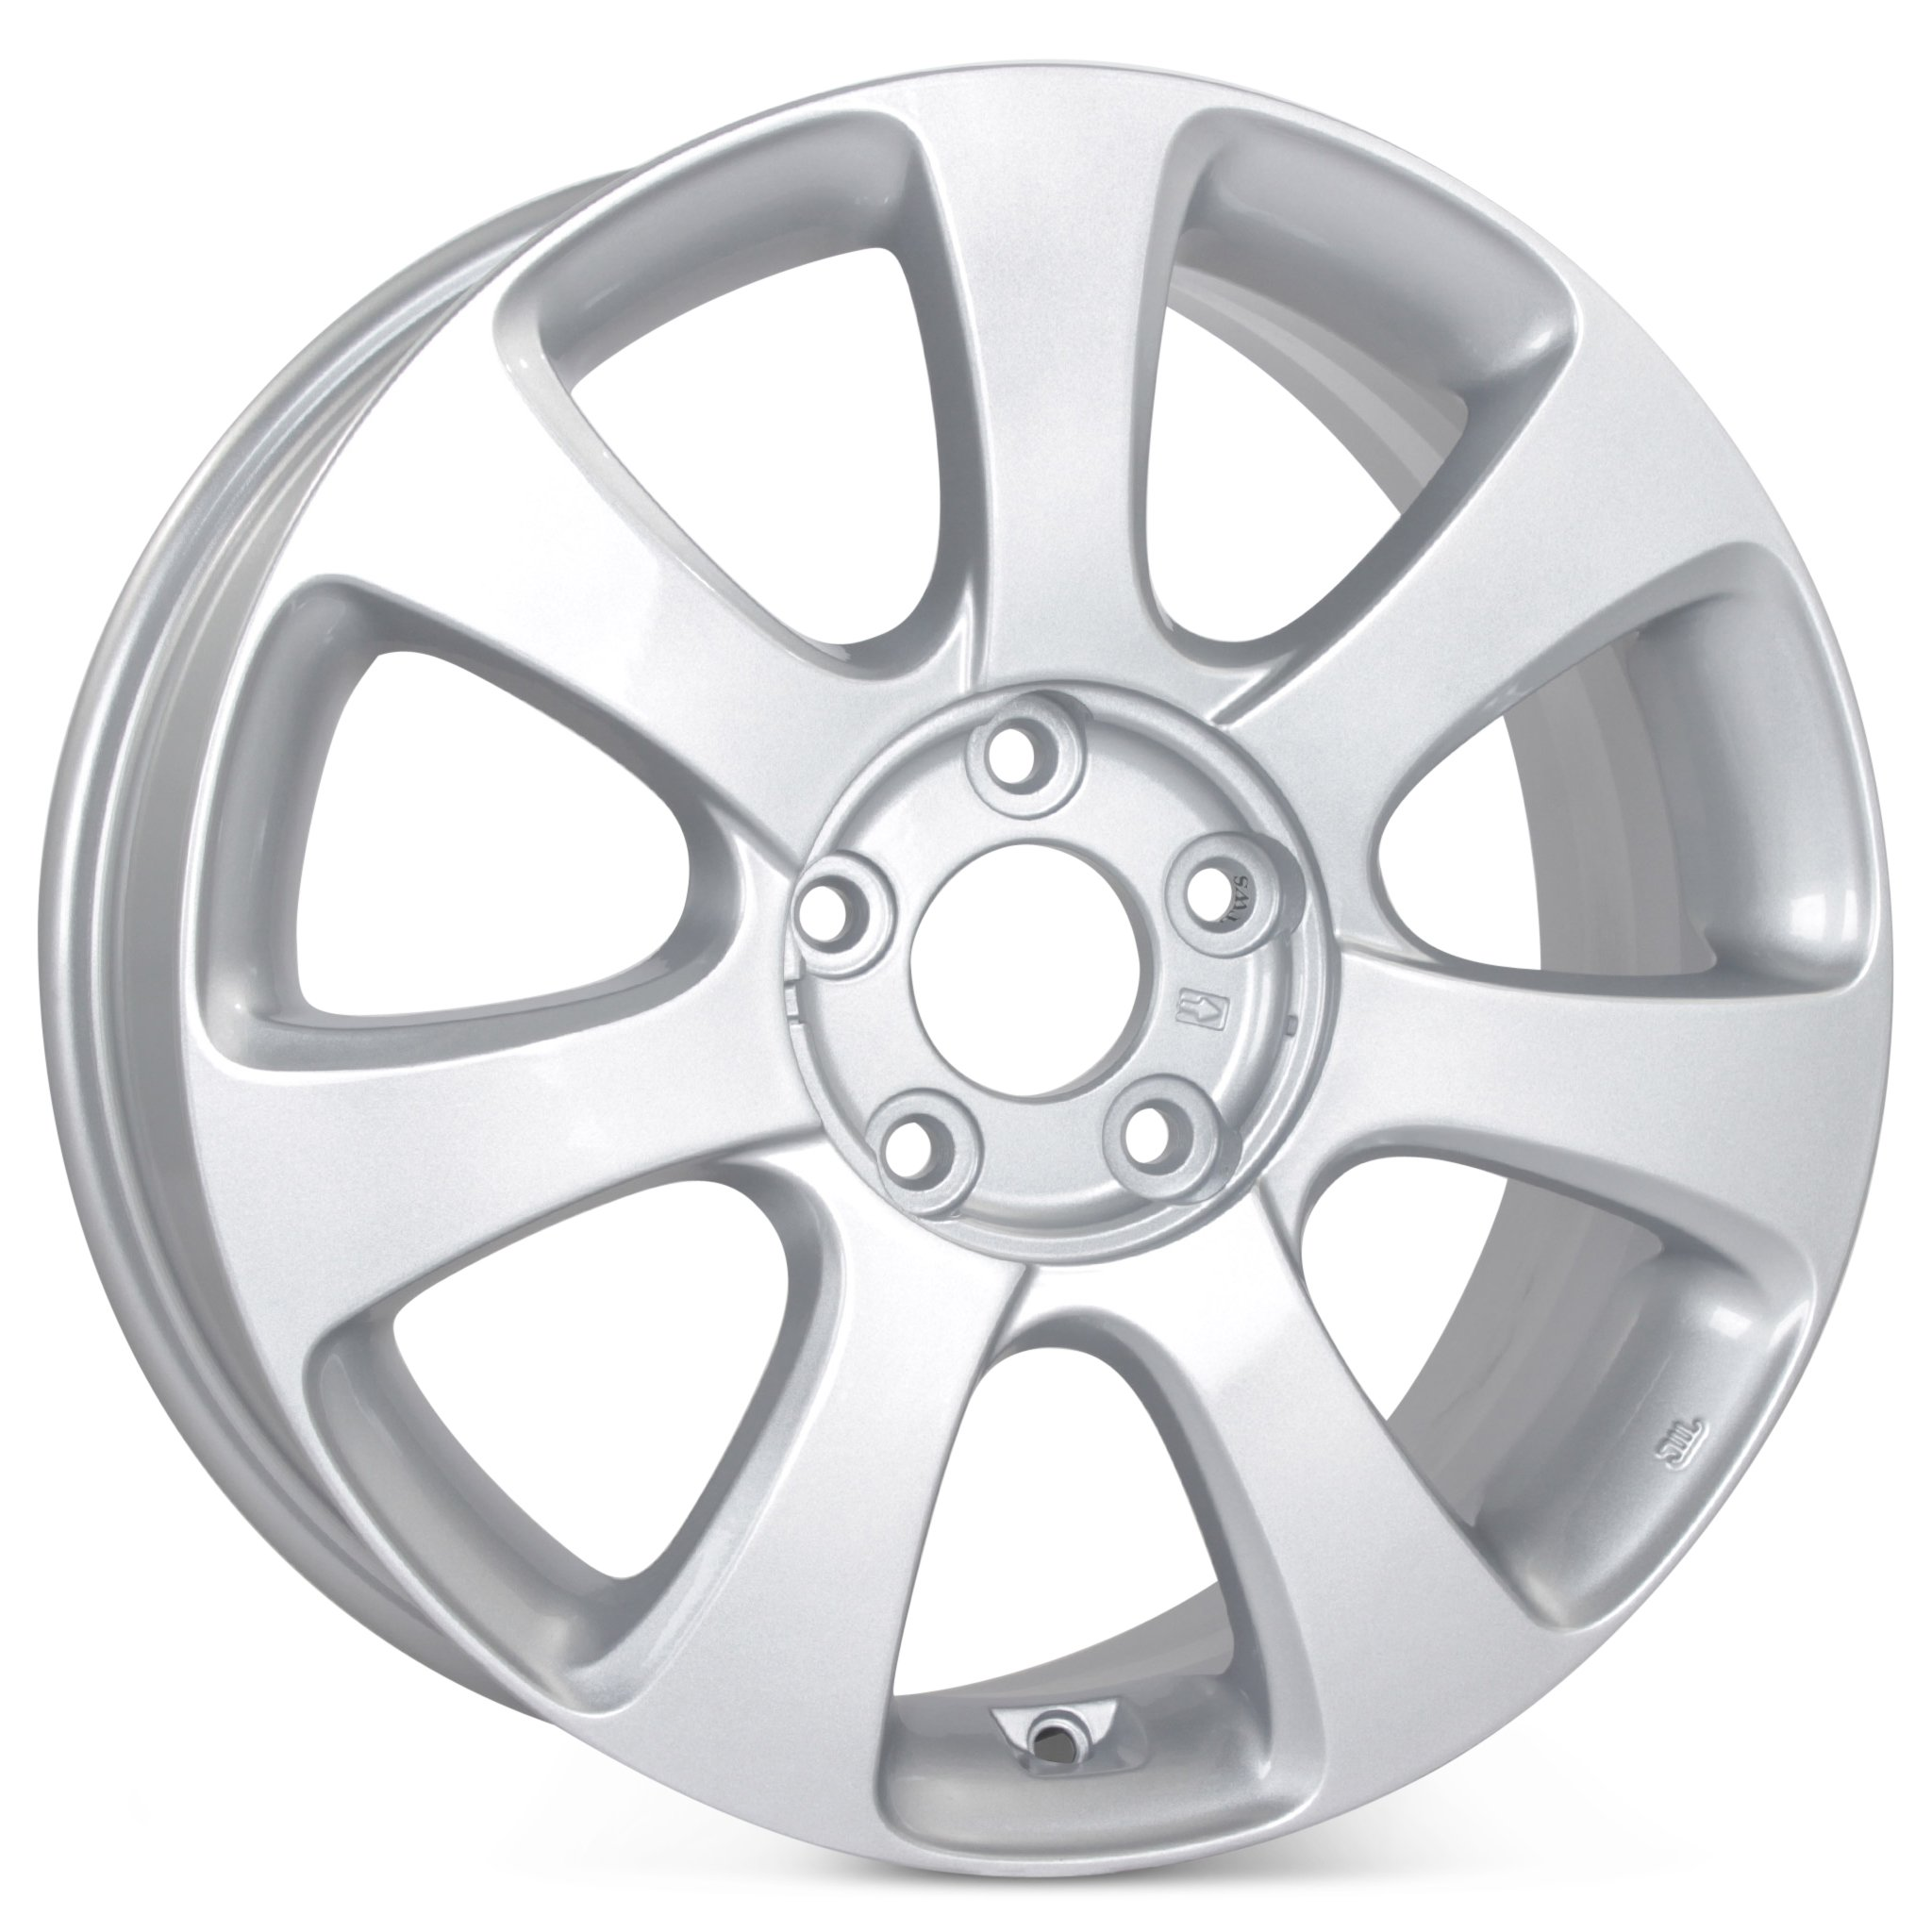 New 17'' Alloy Replacement Wheel for Hyundai Elantra 2011 2012 2013 Rim 70807